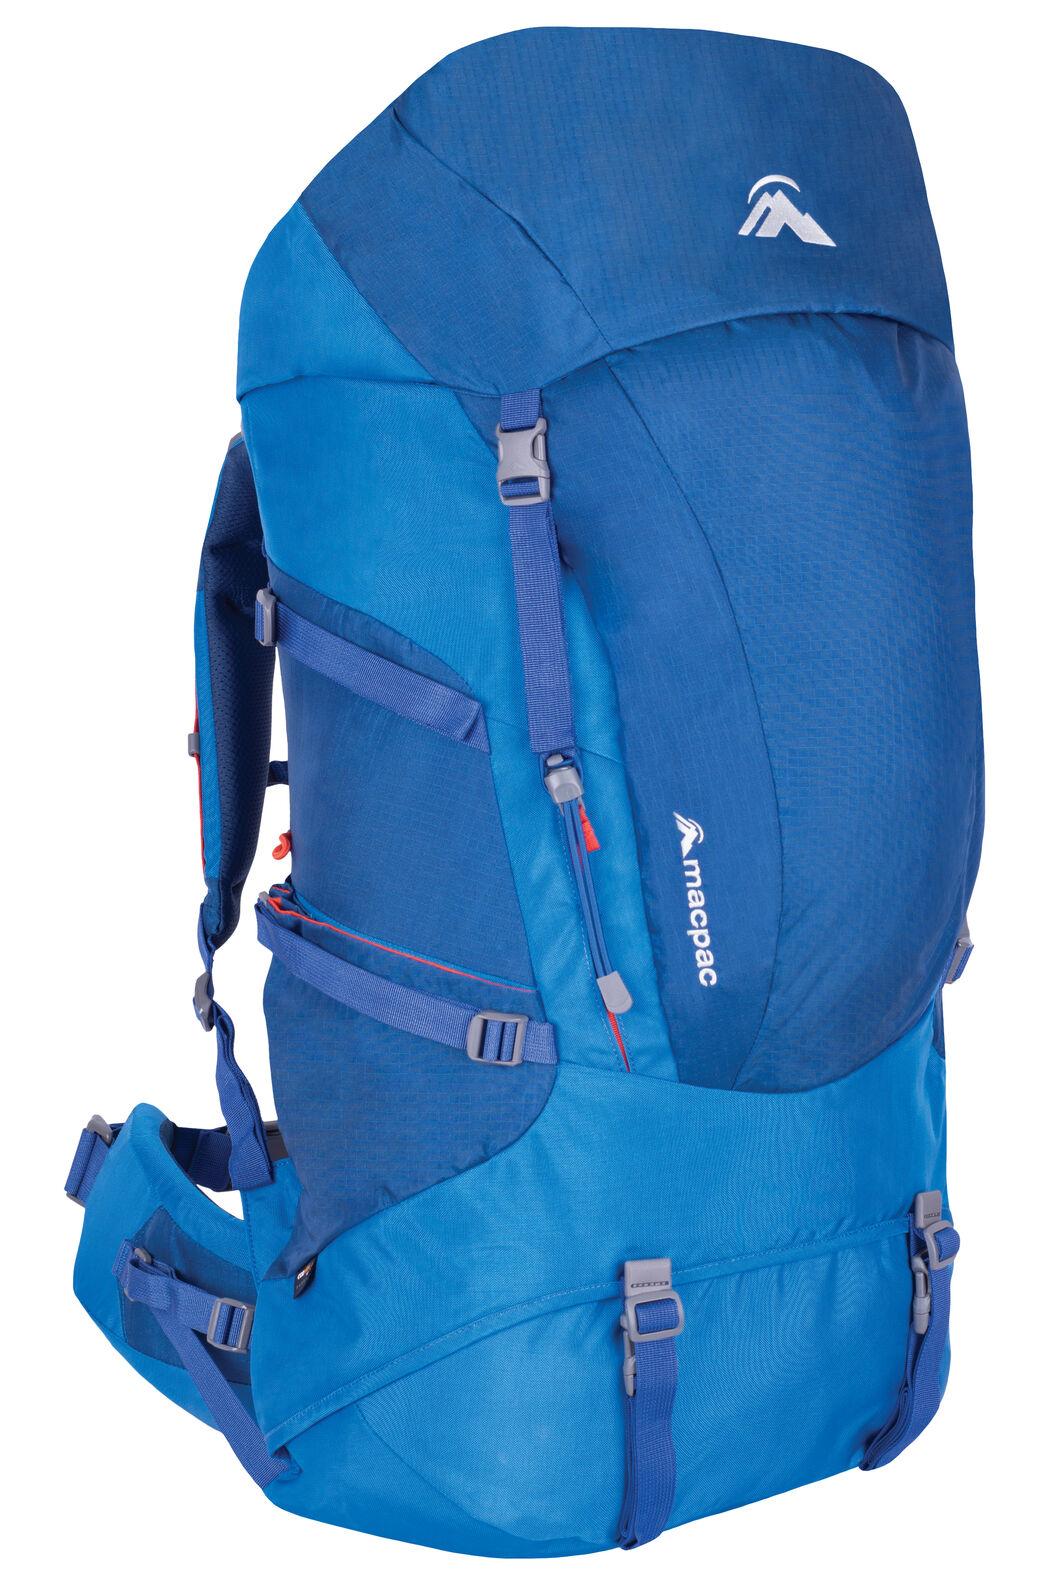 Macpac Torlesse 50L Pack, Victoria Blue, hi-res